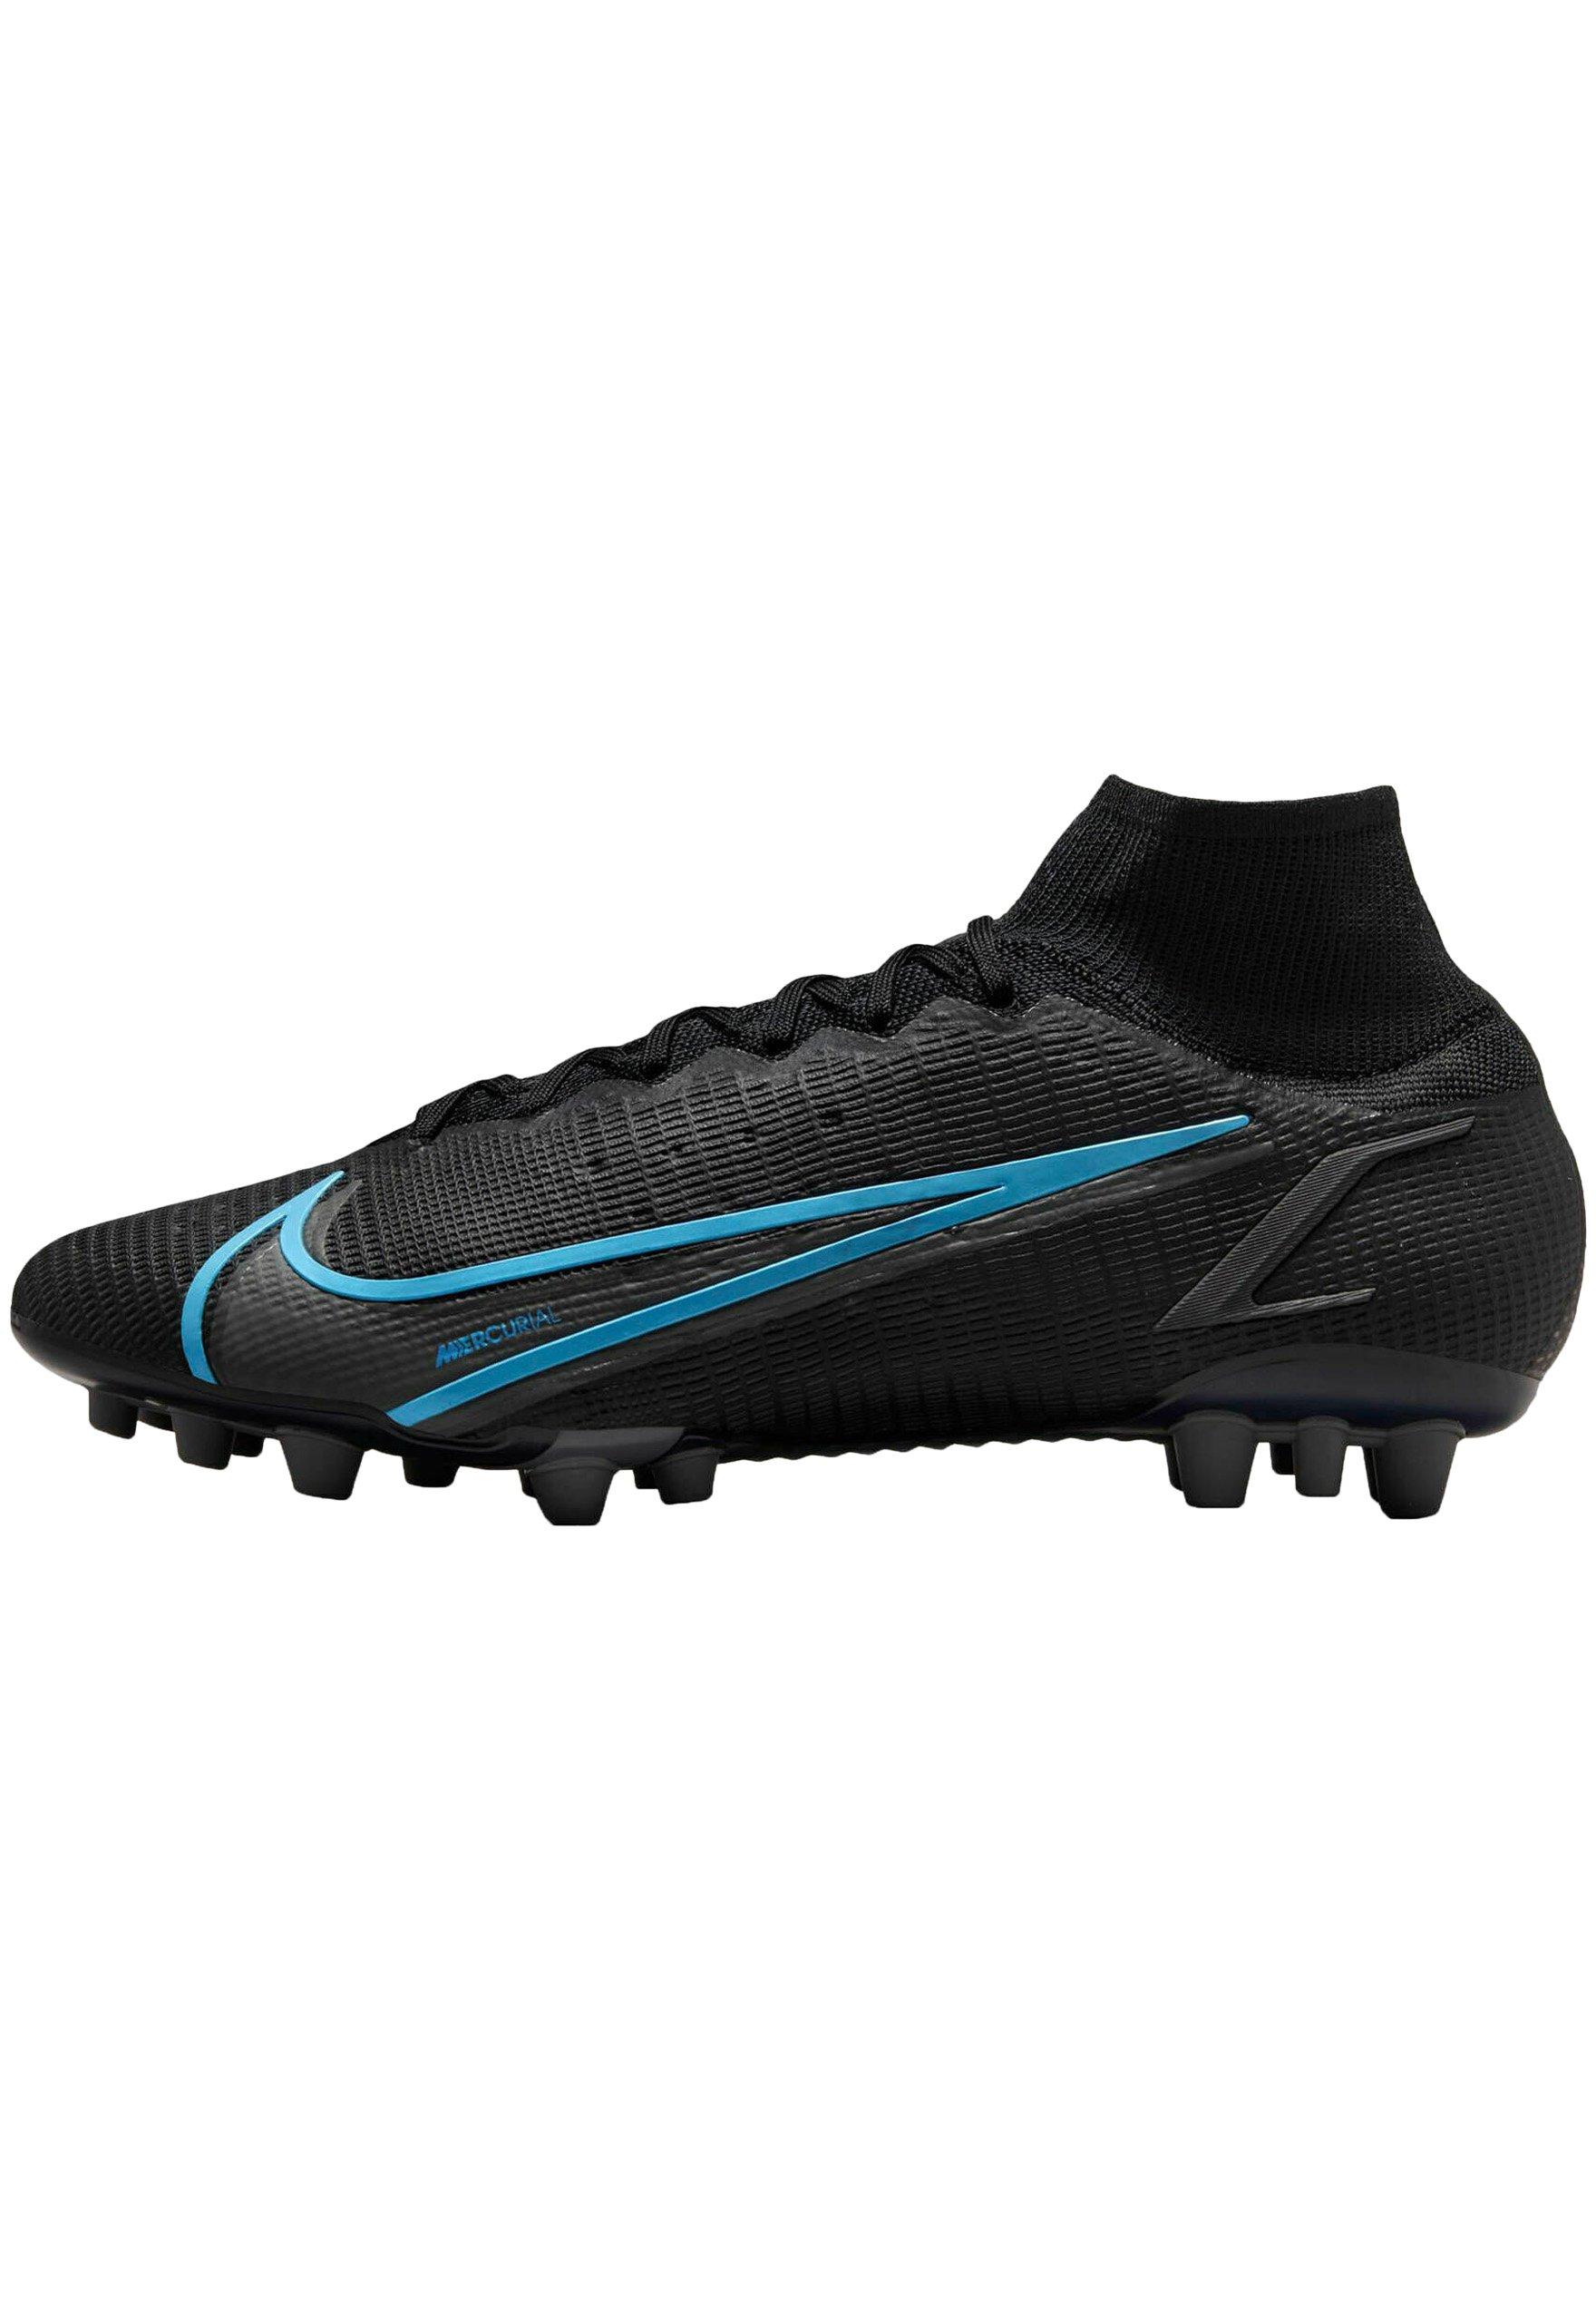 Homme MercurialSuperfly Elite AG - Chaussures de foot à crampons